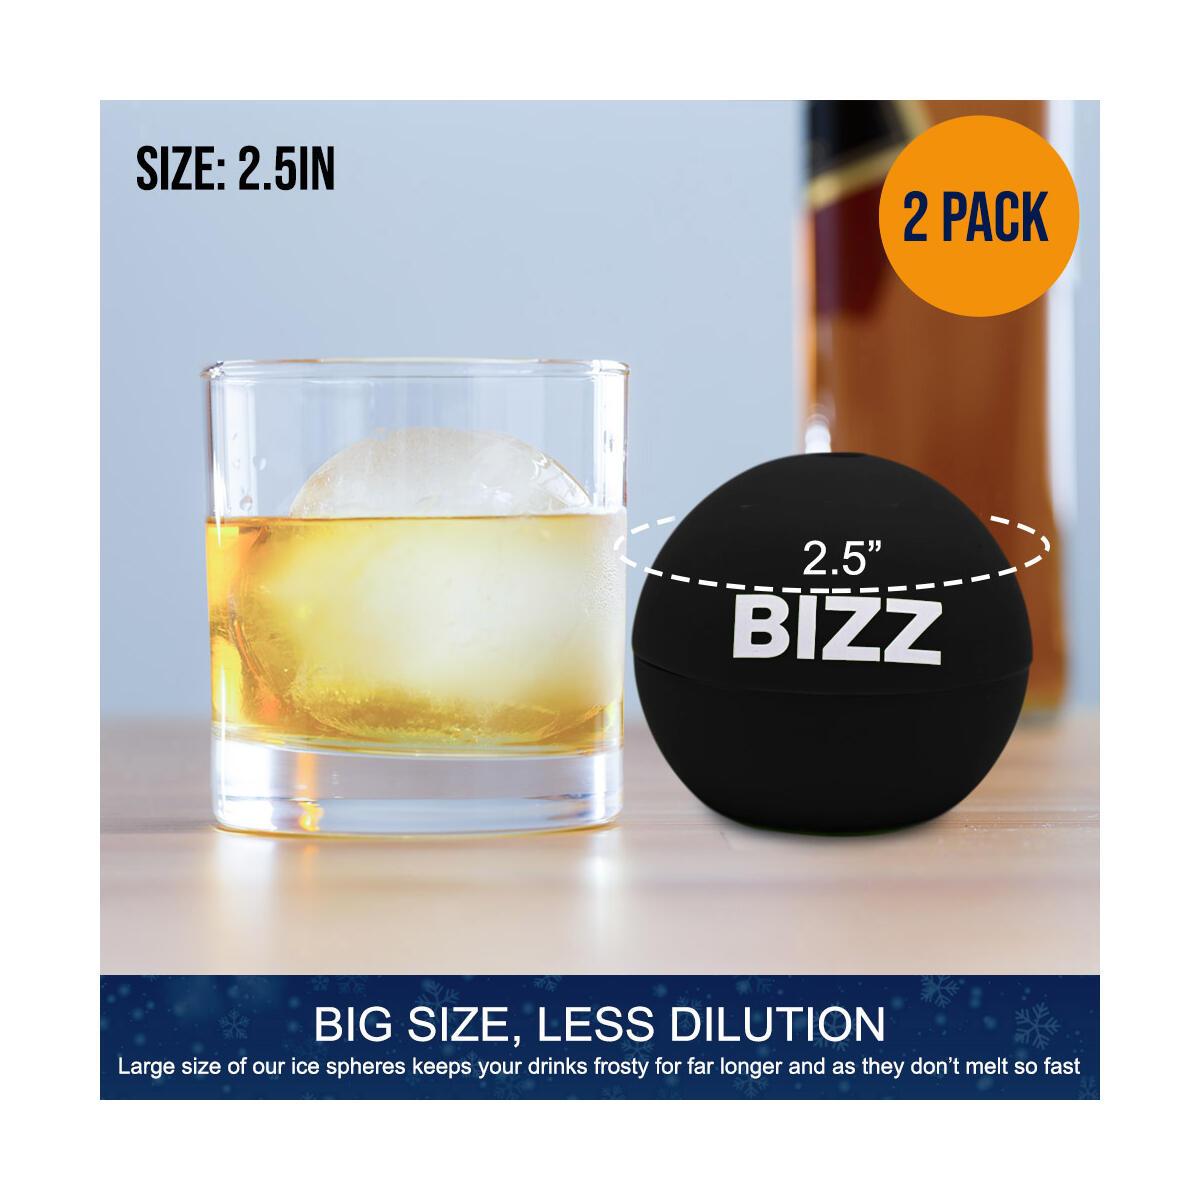 Round Ice Cube Molds - Ice Spheres - 2 Pack - Black